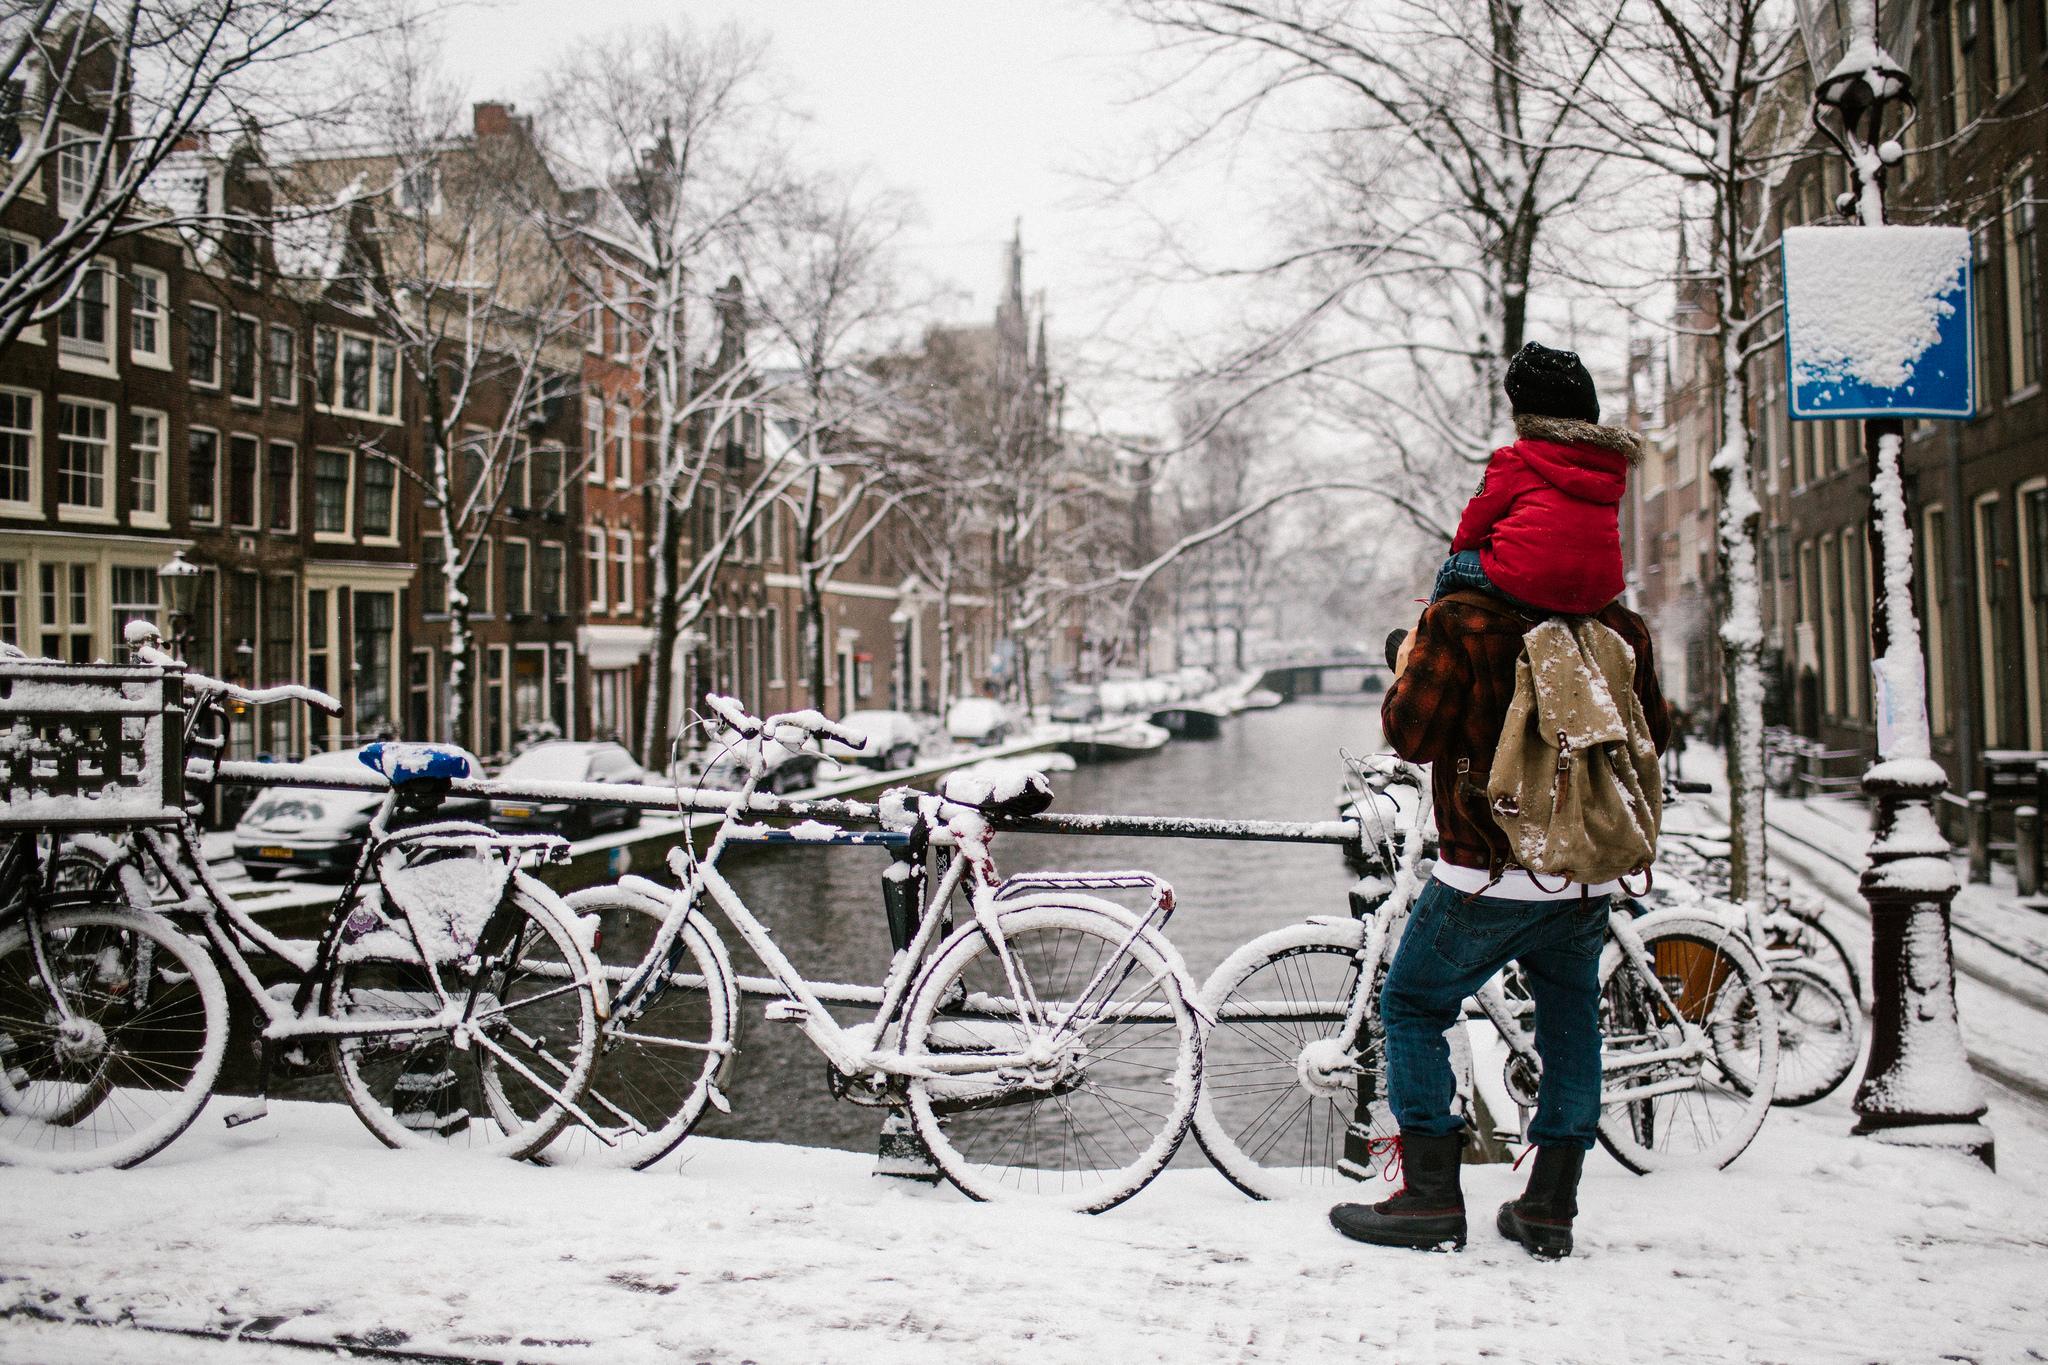 Fotograaf-Amsterdam-Sneeuw-2017.jpg